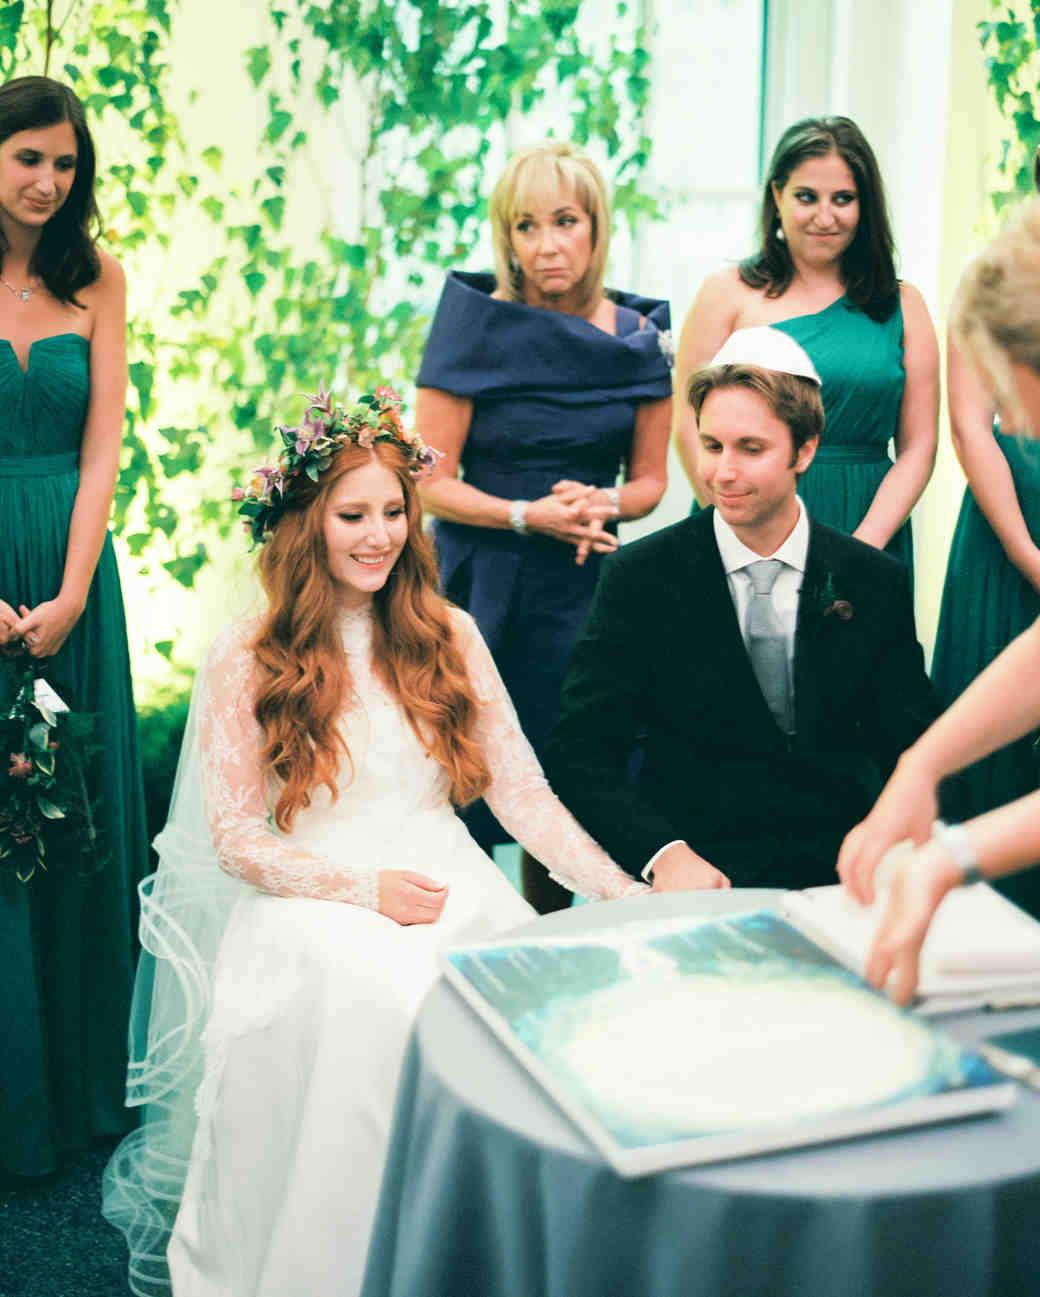 lilly-sean-wedding-ketubah-00348-s112089-0815.jpg